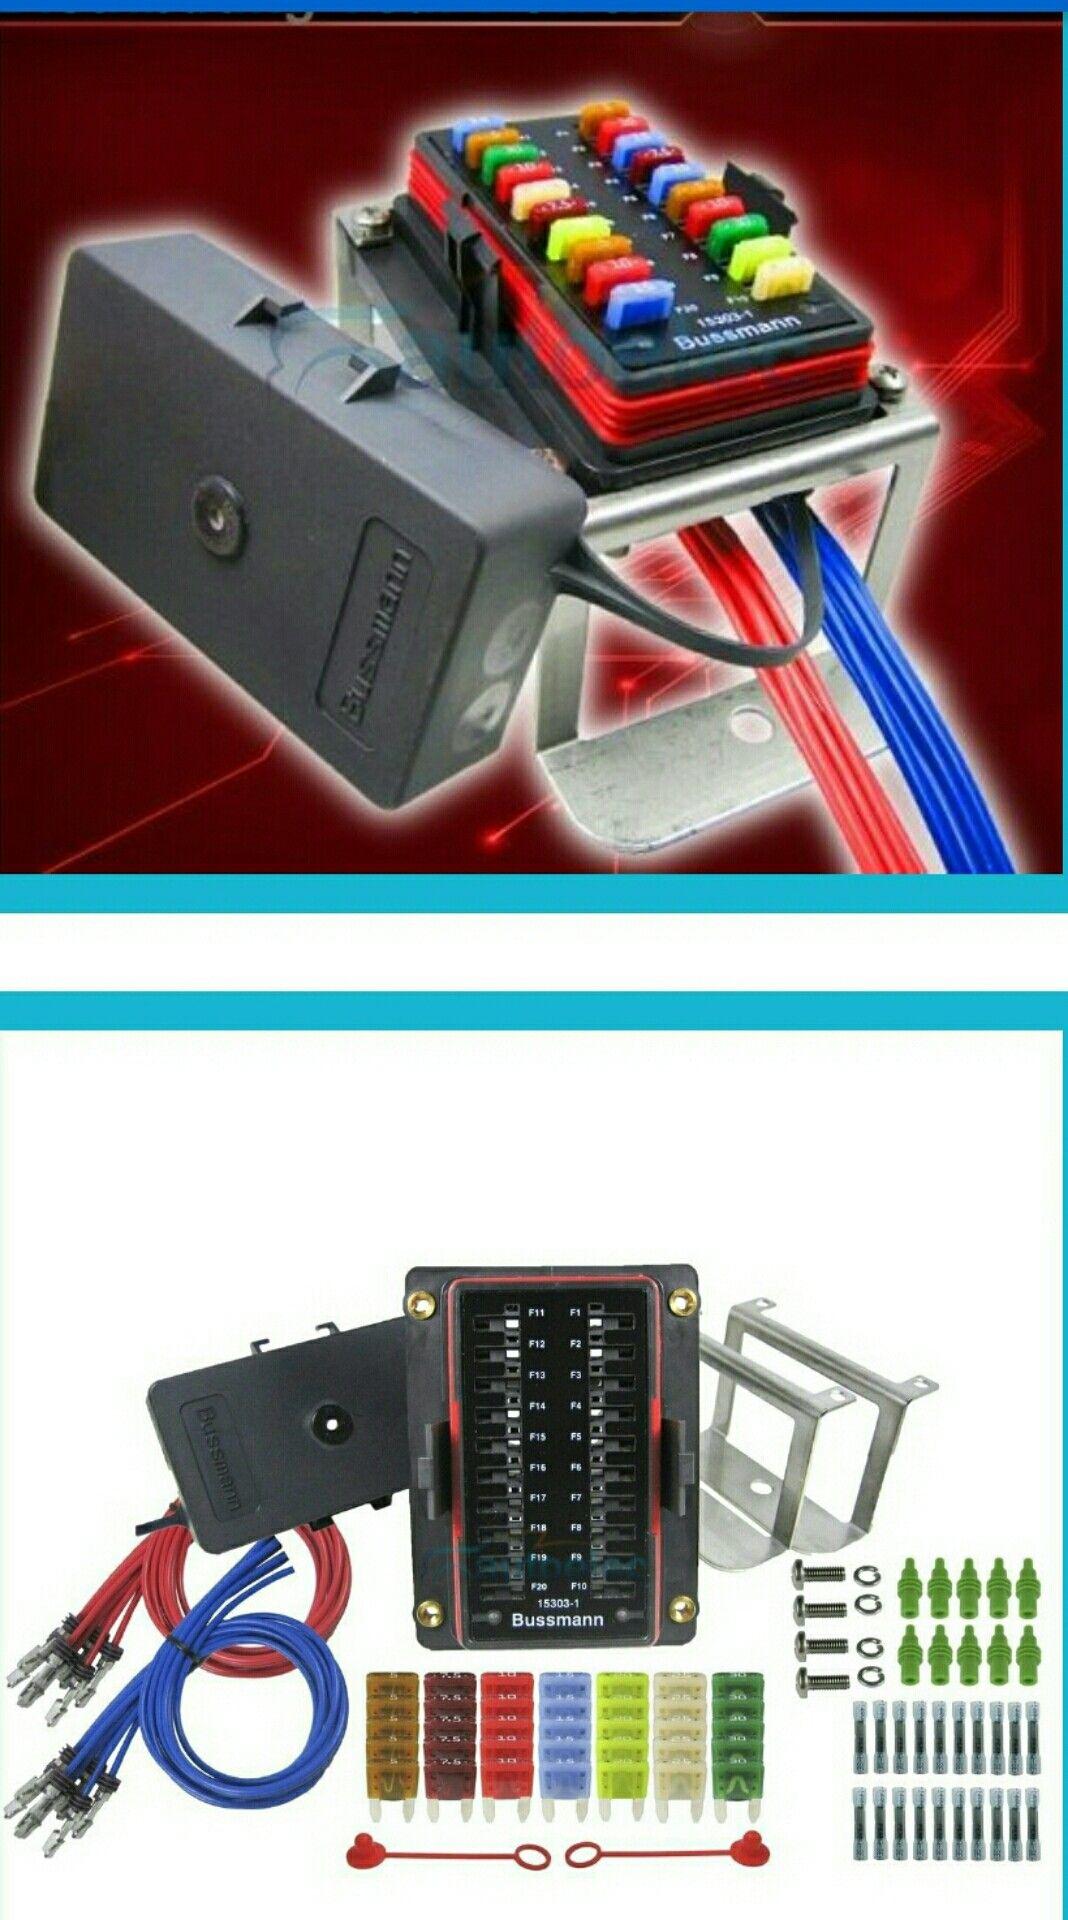 hight resolution of car audio bussmann 20 mini fuse holder ip66 diy electronics electronics projects k5 blazer ice